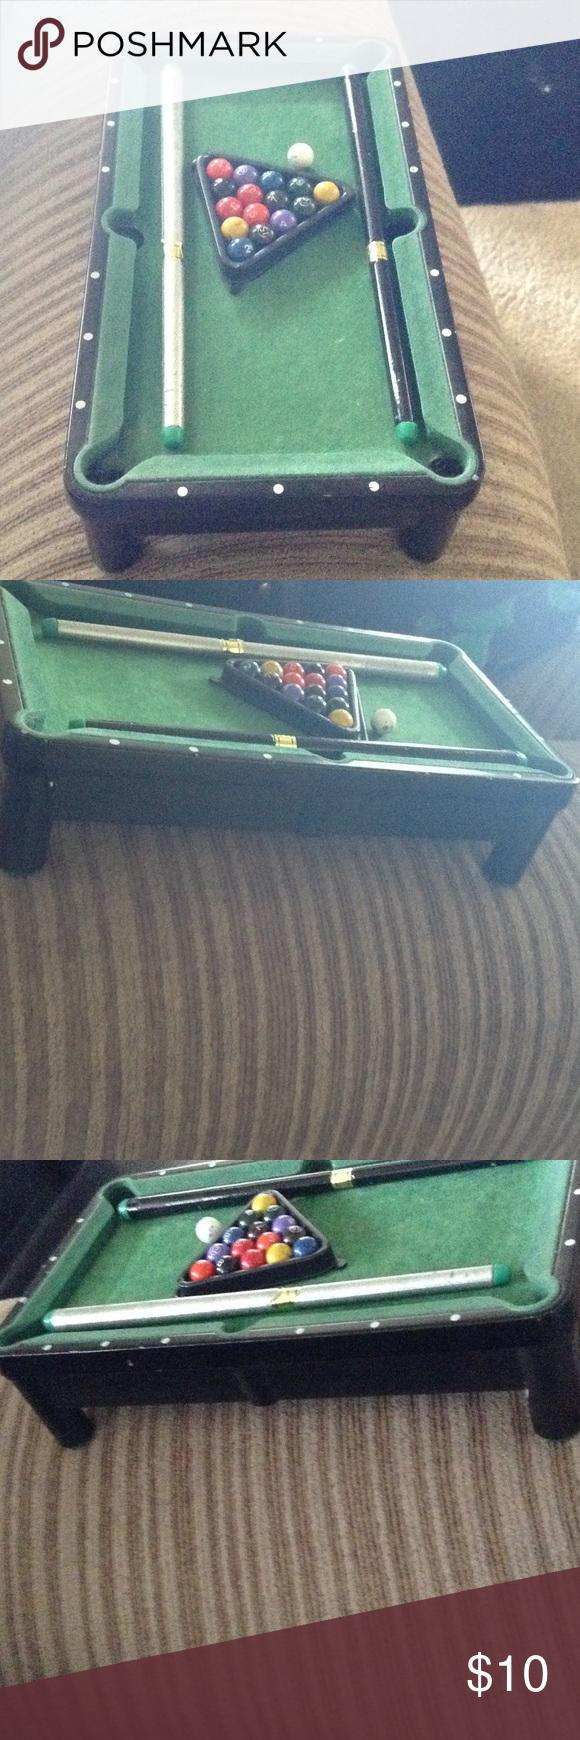 Mini Tabletop Pool Table Pinterest Tabletop Pool Table Pool - Used mini pool table